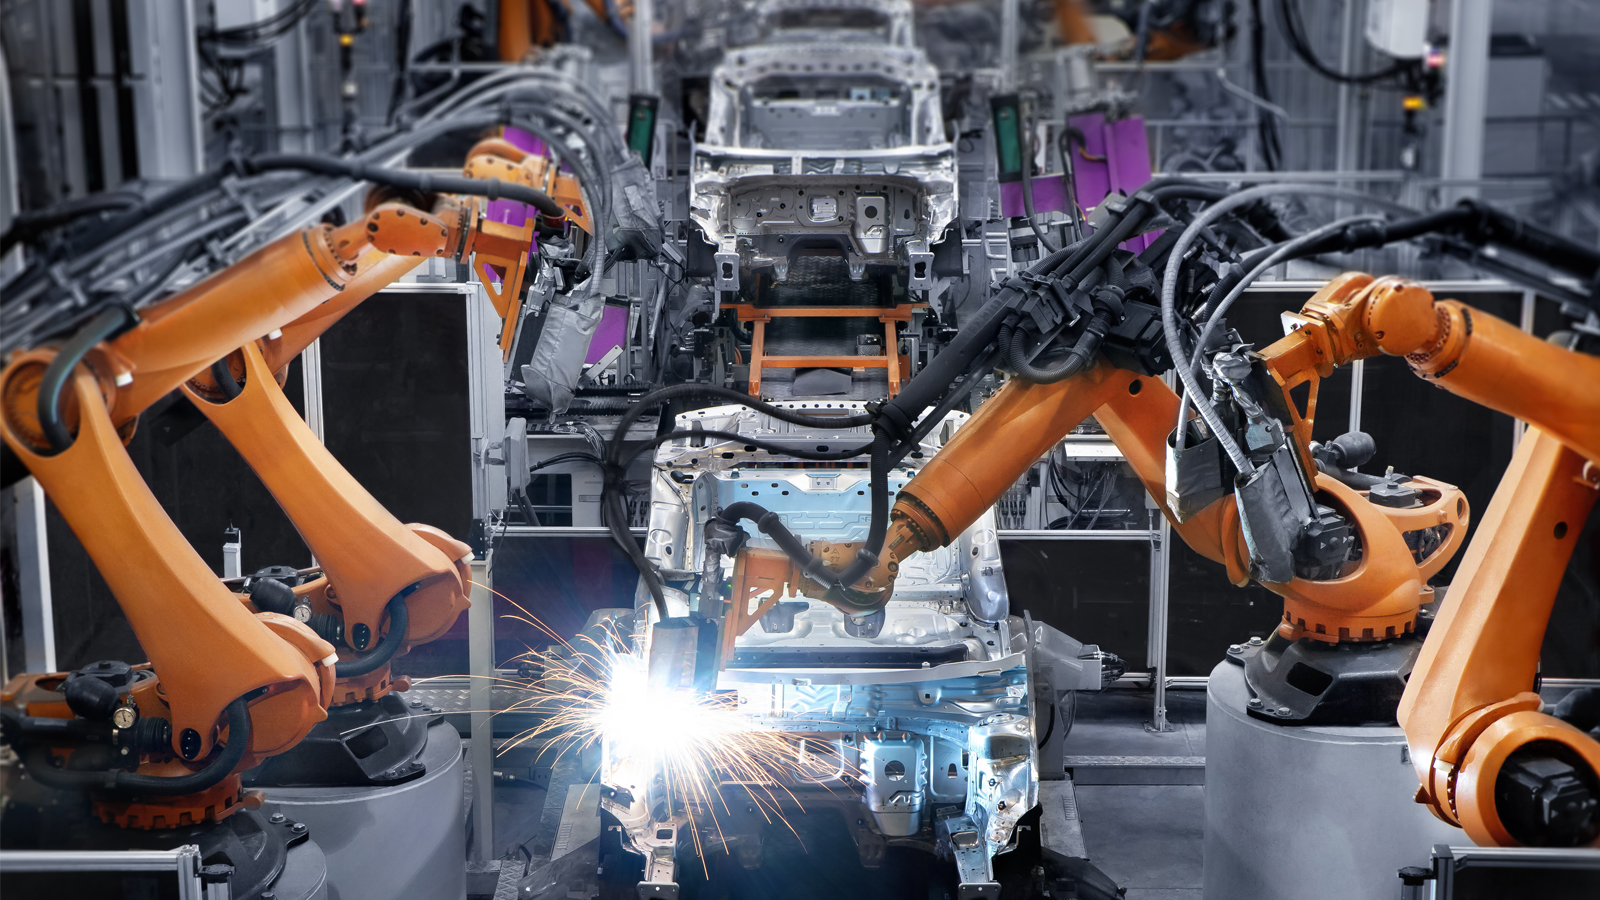 DEXMA manufacturing